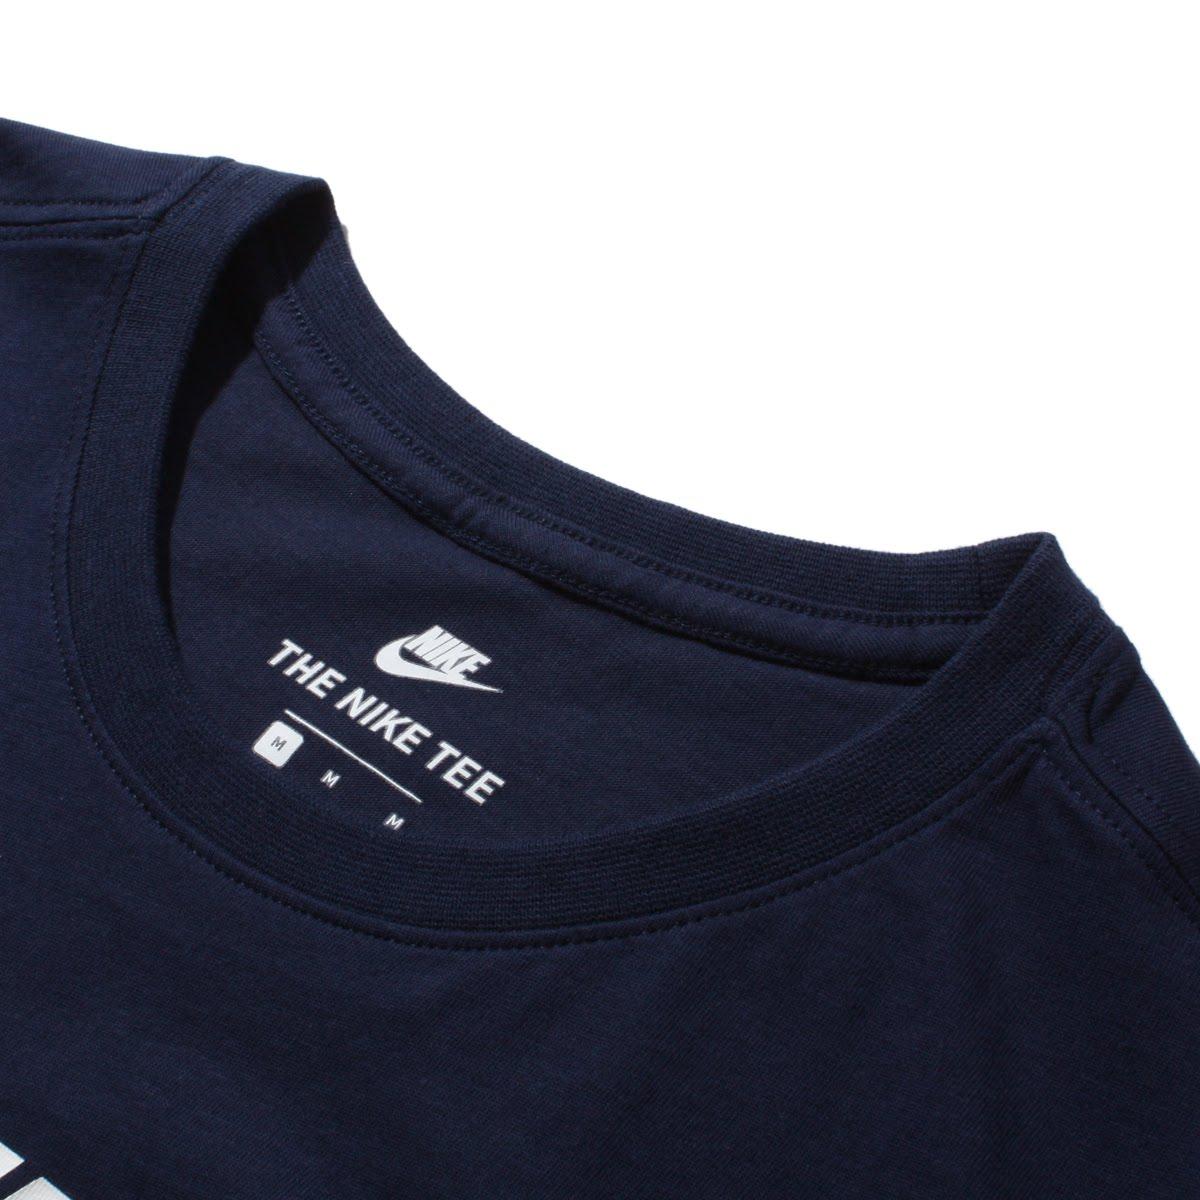 2f3e486e444 NIKEASMNSWTEEICONFUTURA(ナイキフューチュラアイコンTシャツ)OBSIDIAN WHITE メンズTシャツ